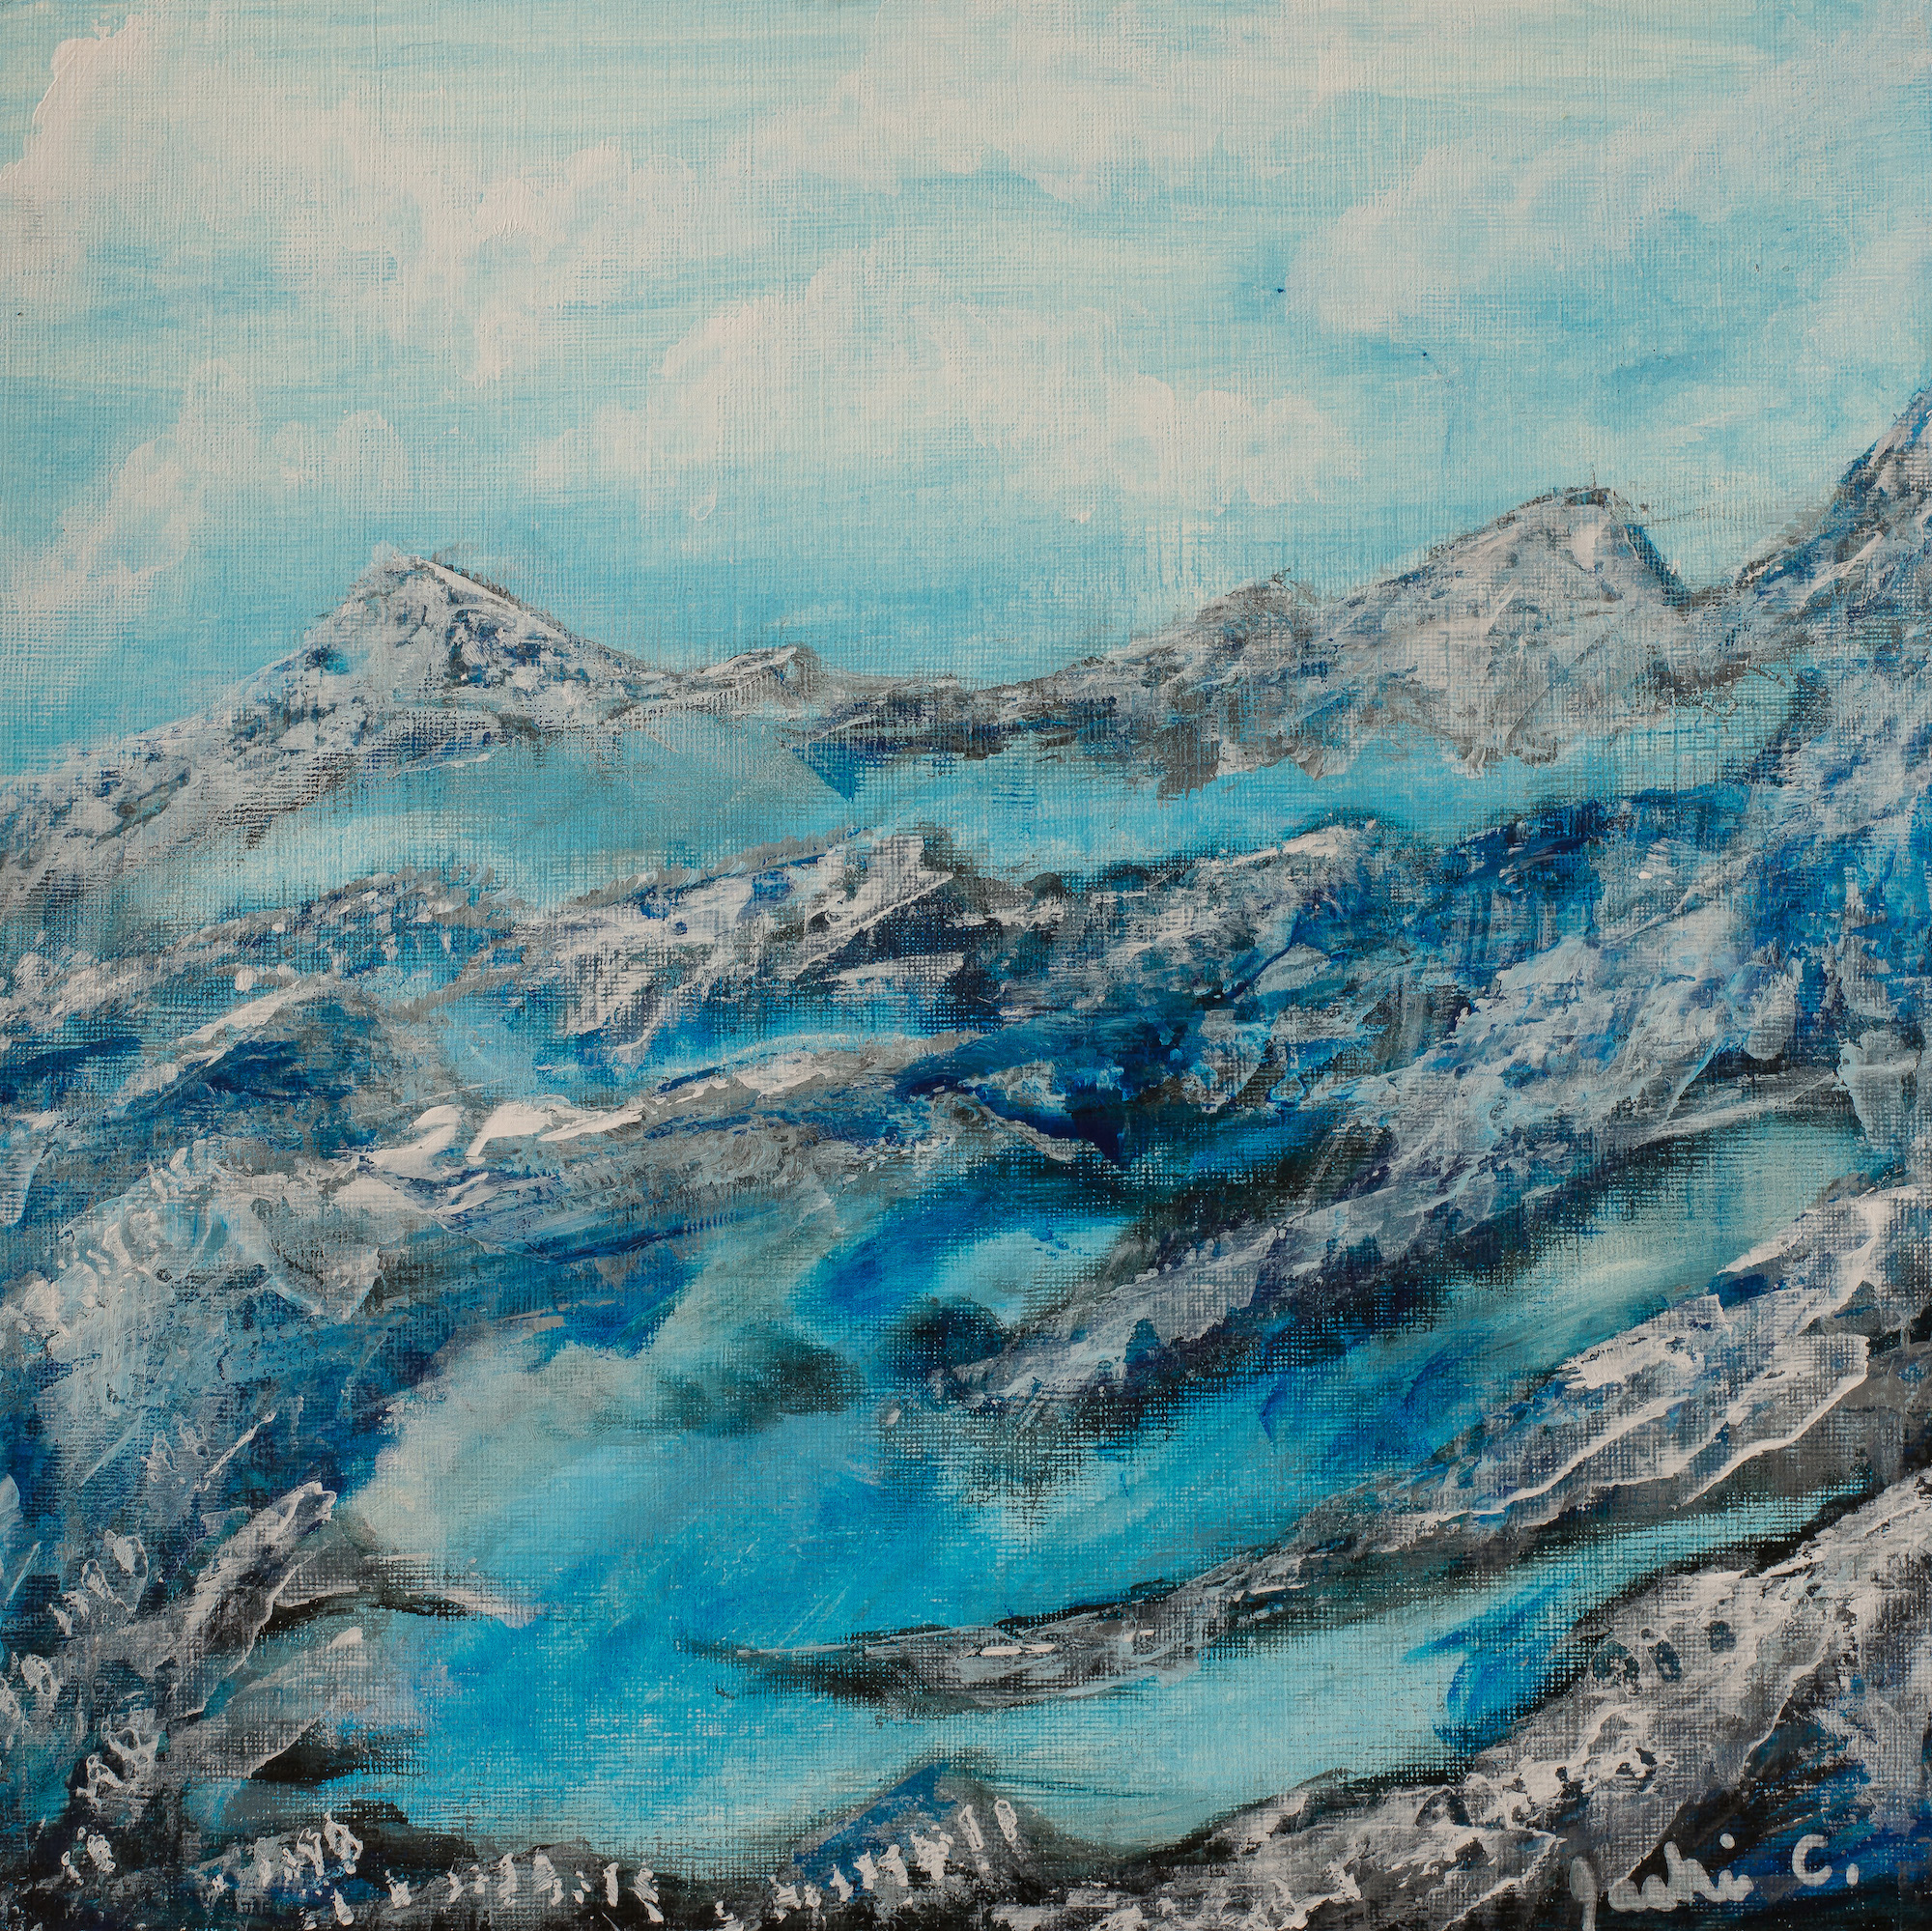 mountain landscape art on canvas